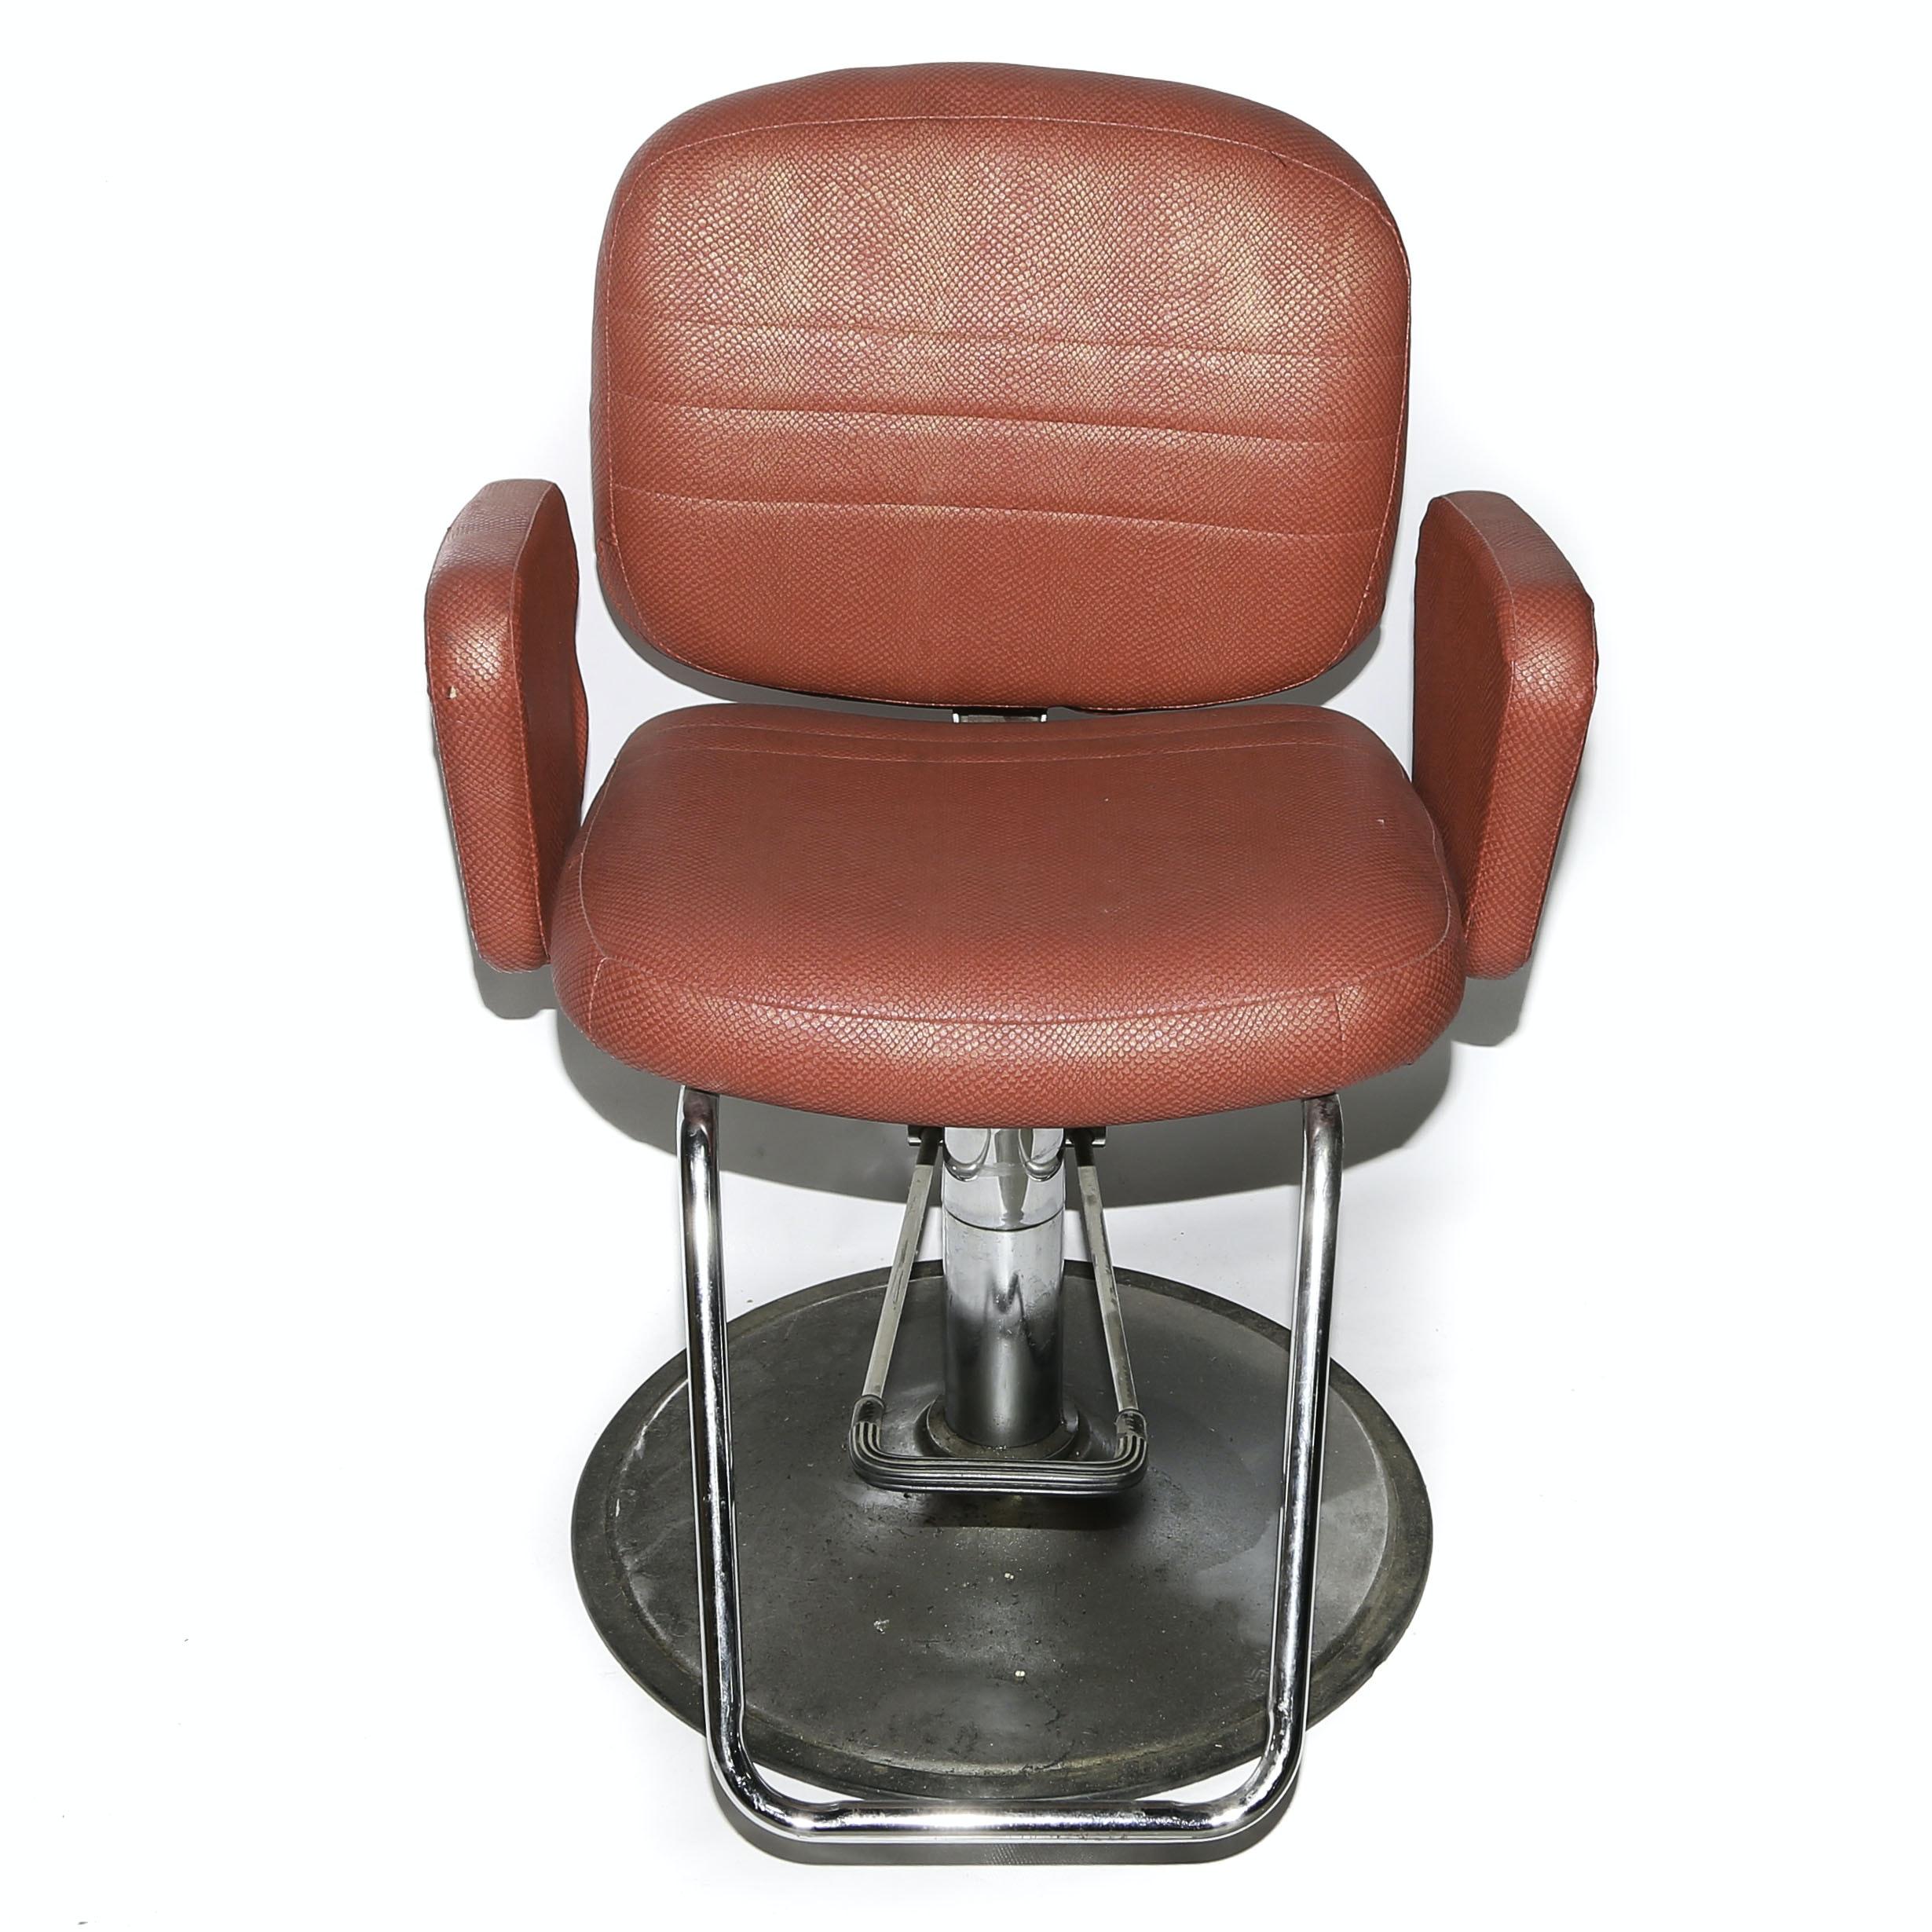 Global Upholstery Co., Inc. Salon Chair